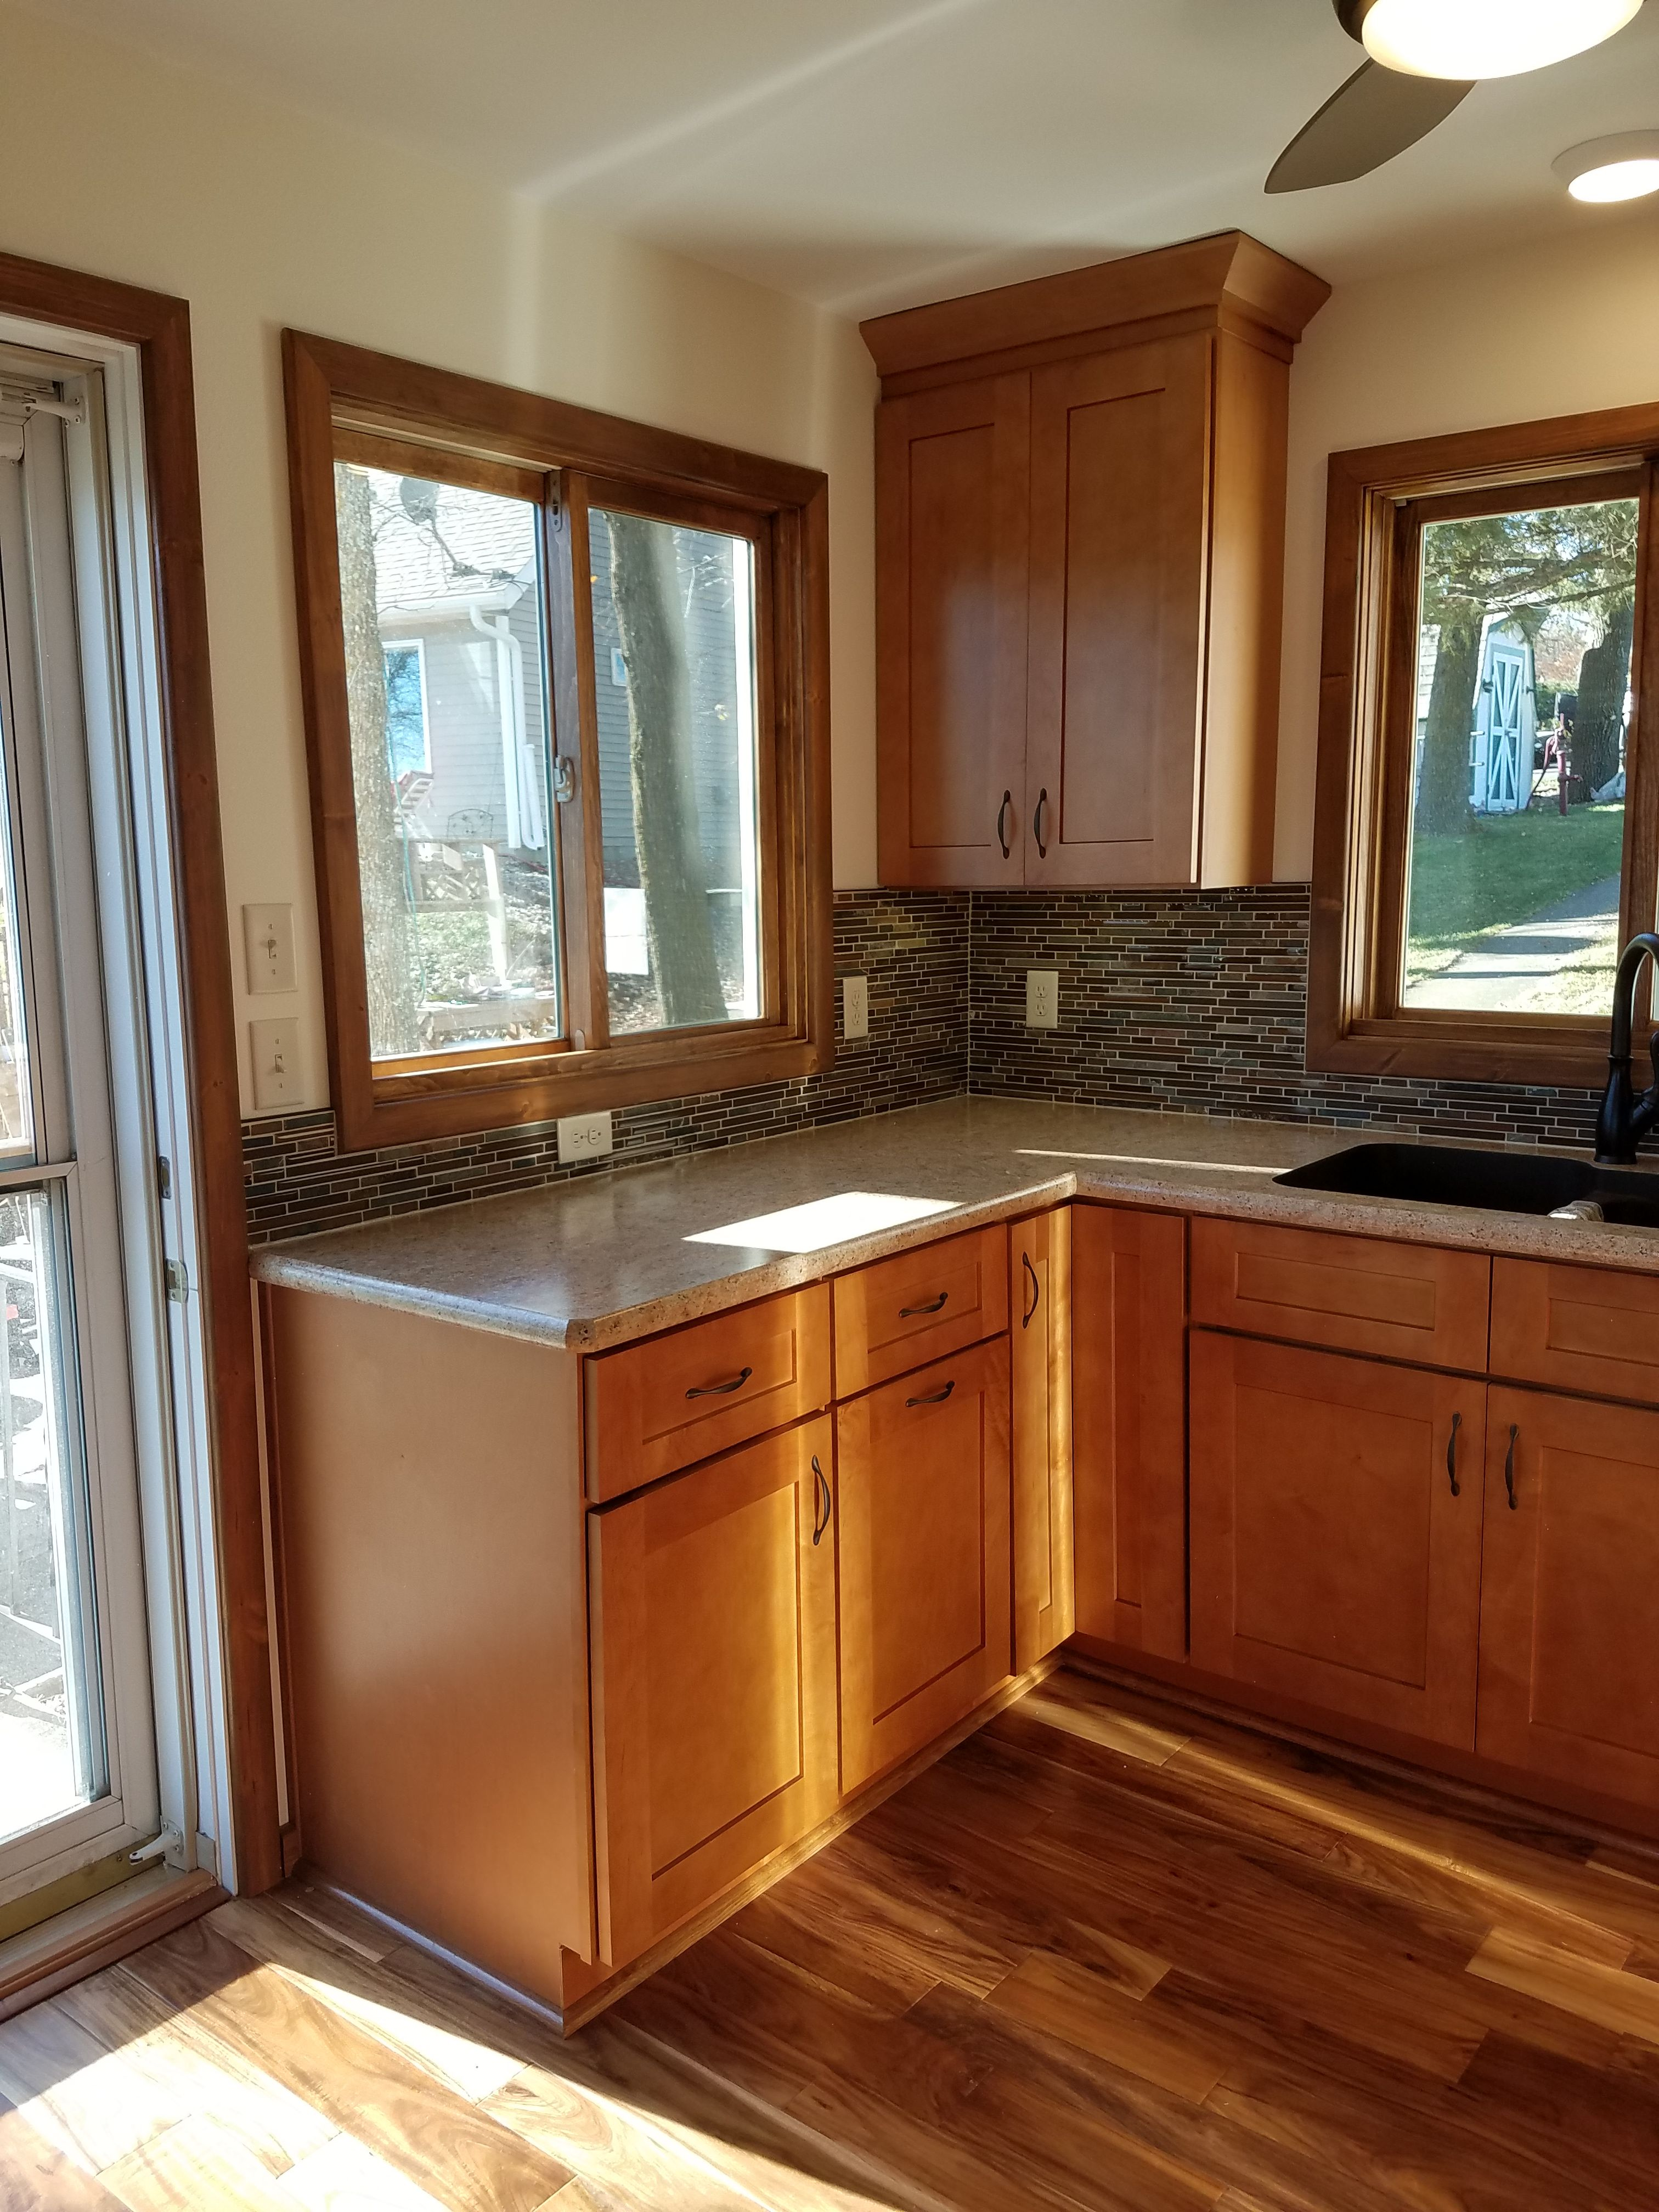 Traditional Kitchen Tops 30mm Essa Stone Torrone Doors Panels Tonsley Shaker Door Colour Laminex Parchment Kitchen Kitchen Tops Traditional Kitchen